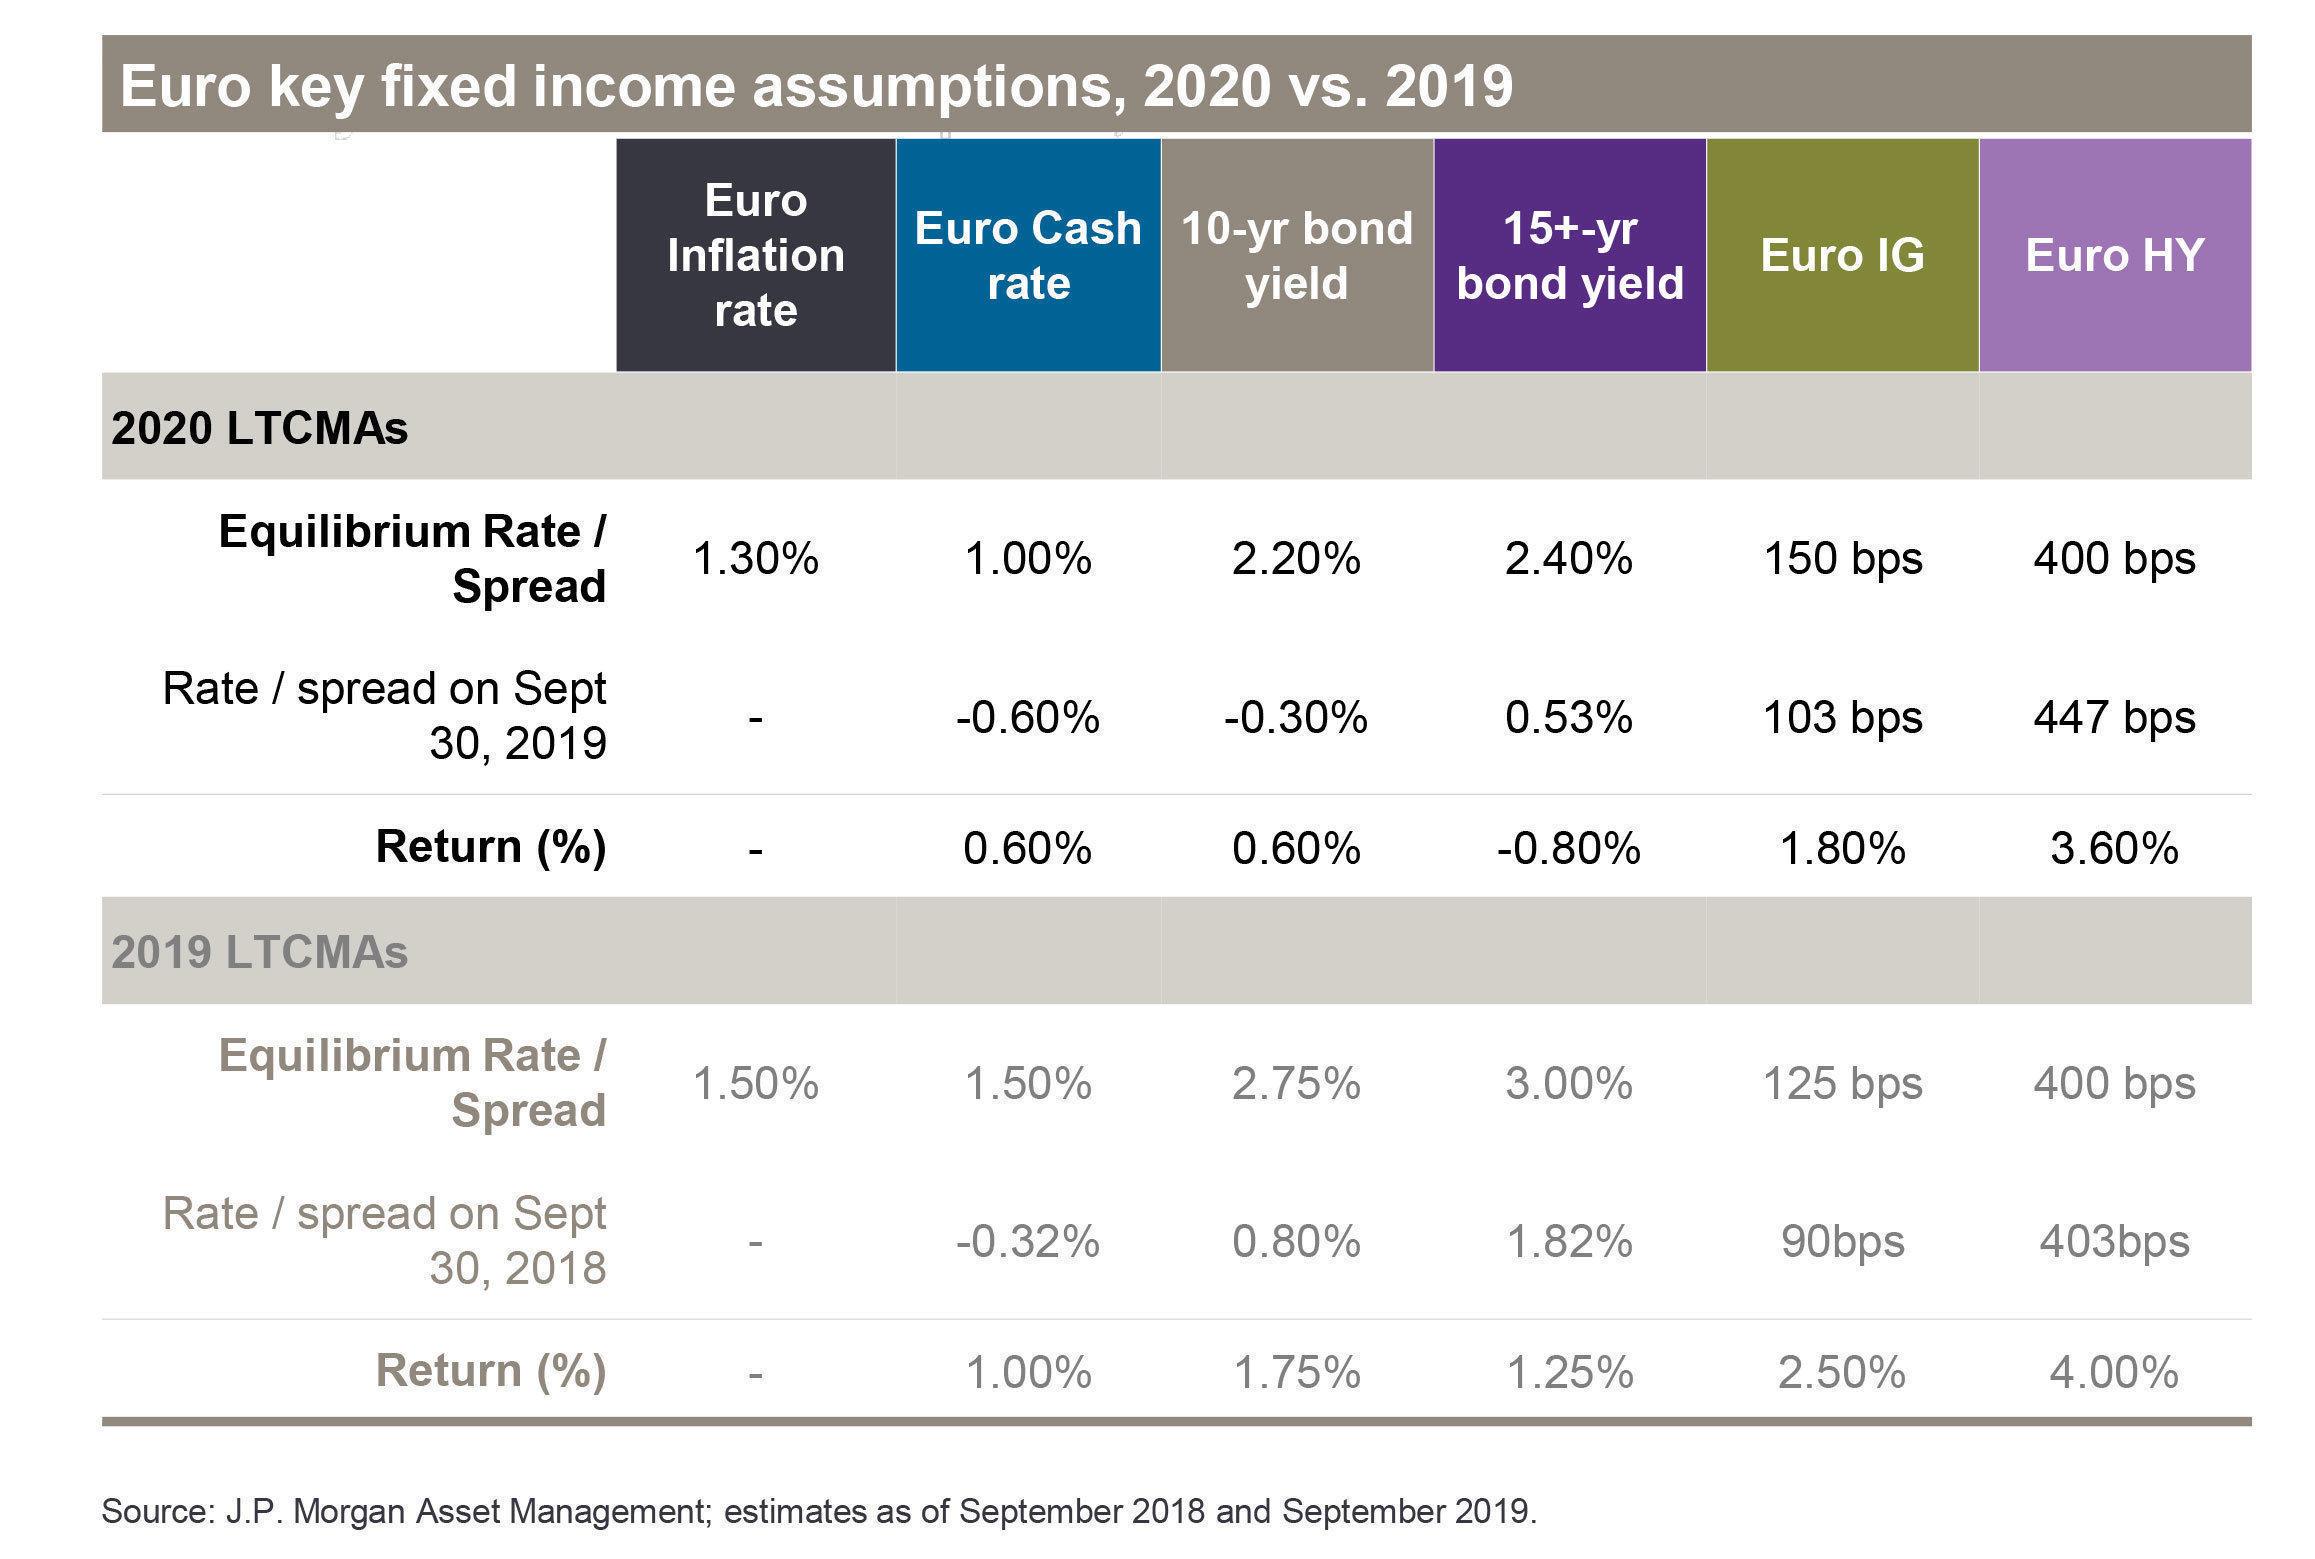 JPMAM Fixed Income